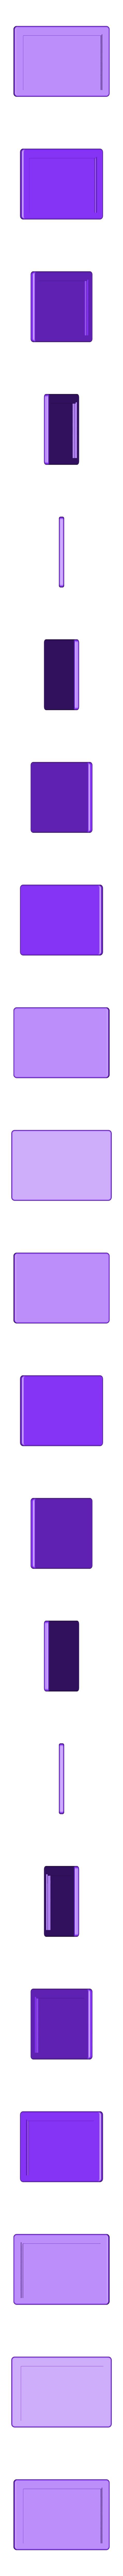 Piece - Part 9.stl Download free STL file Taquin CULTS / Sliding Puzzle • 3D print model, Valelab3D